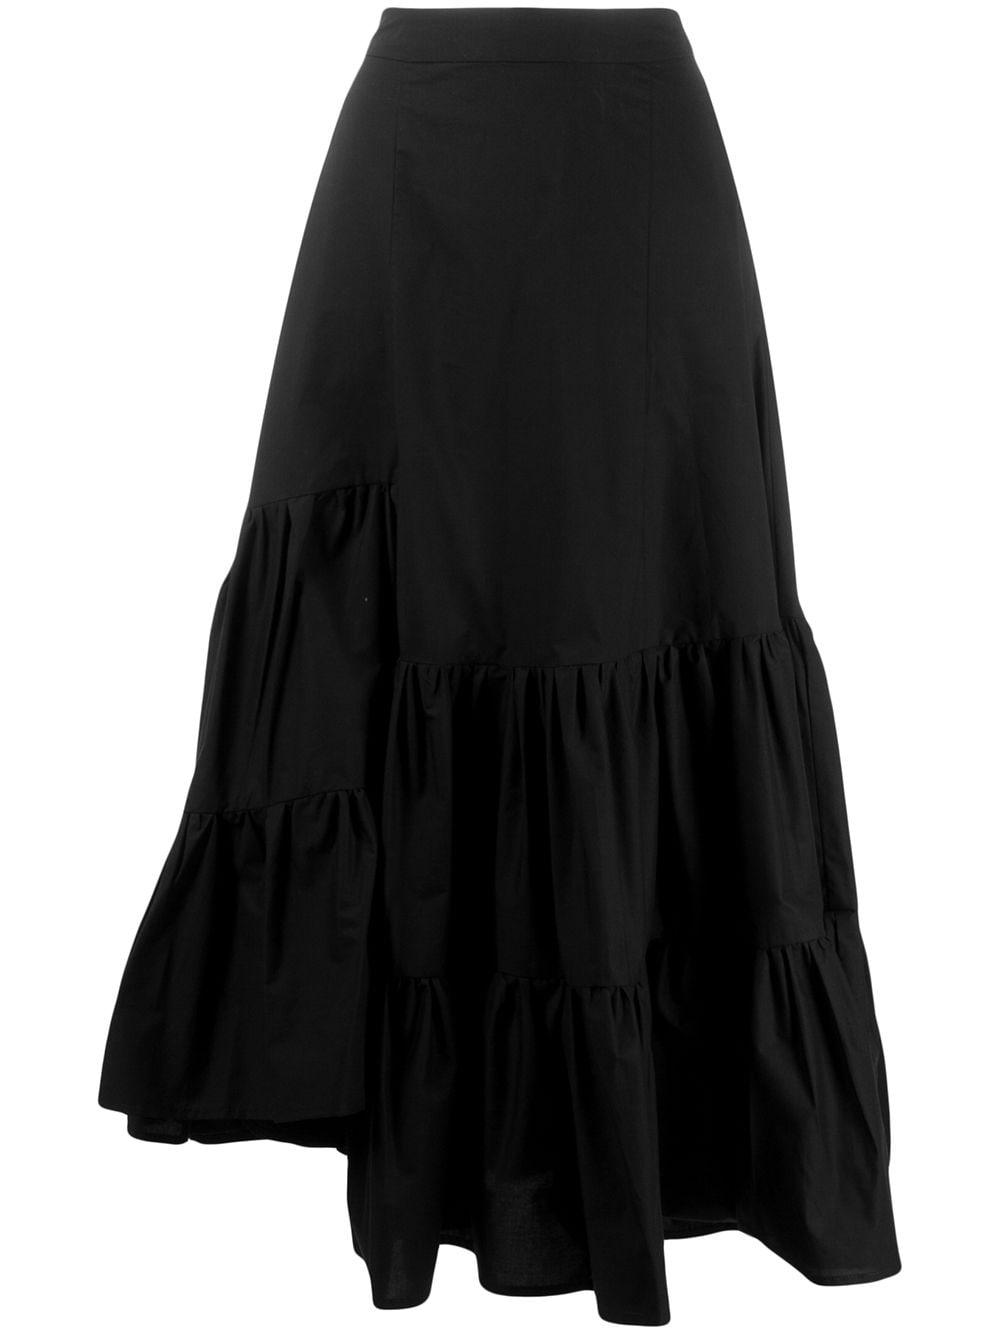 Mm6 Maison Margiela asymmetric tiered skirt